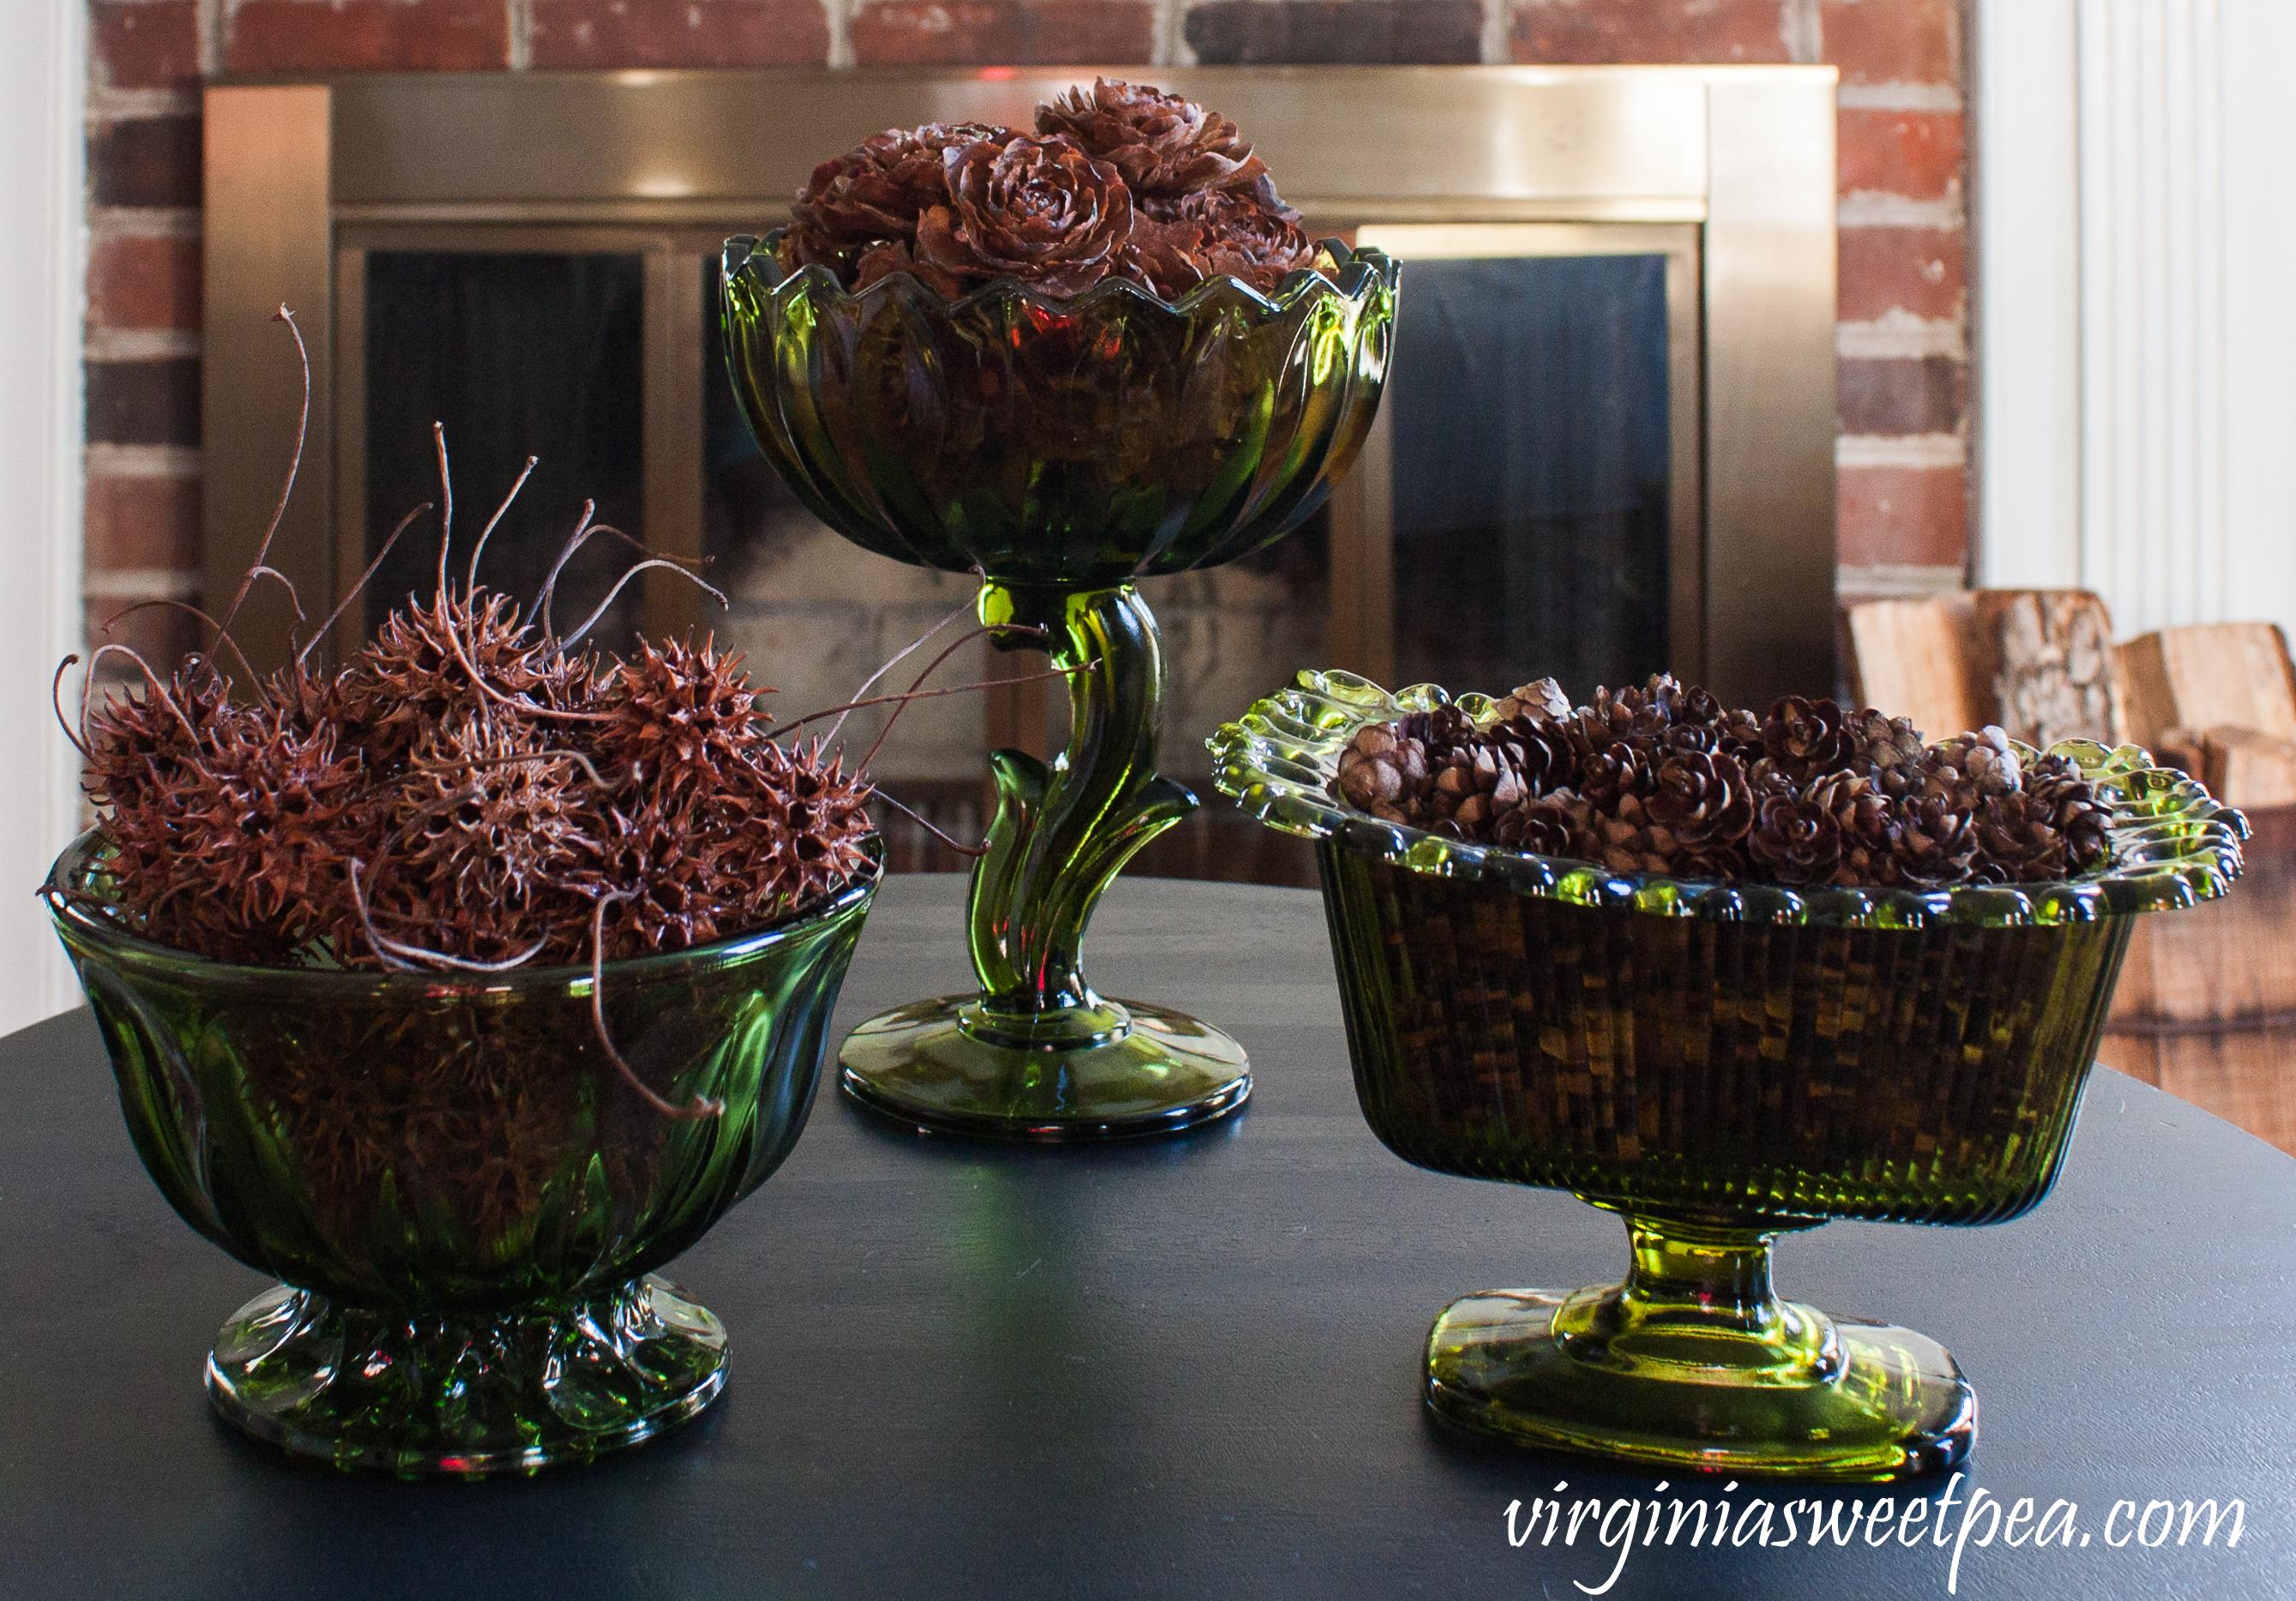 Three vintage green vases are filled with items from nature including Deodora Cedar cones, Hemlock cones, and Sweet Gum seed pods. #vintagegreenglass #deodoracedar #hemlockcone #sweetgumtree